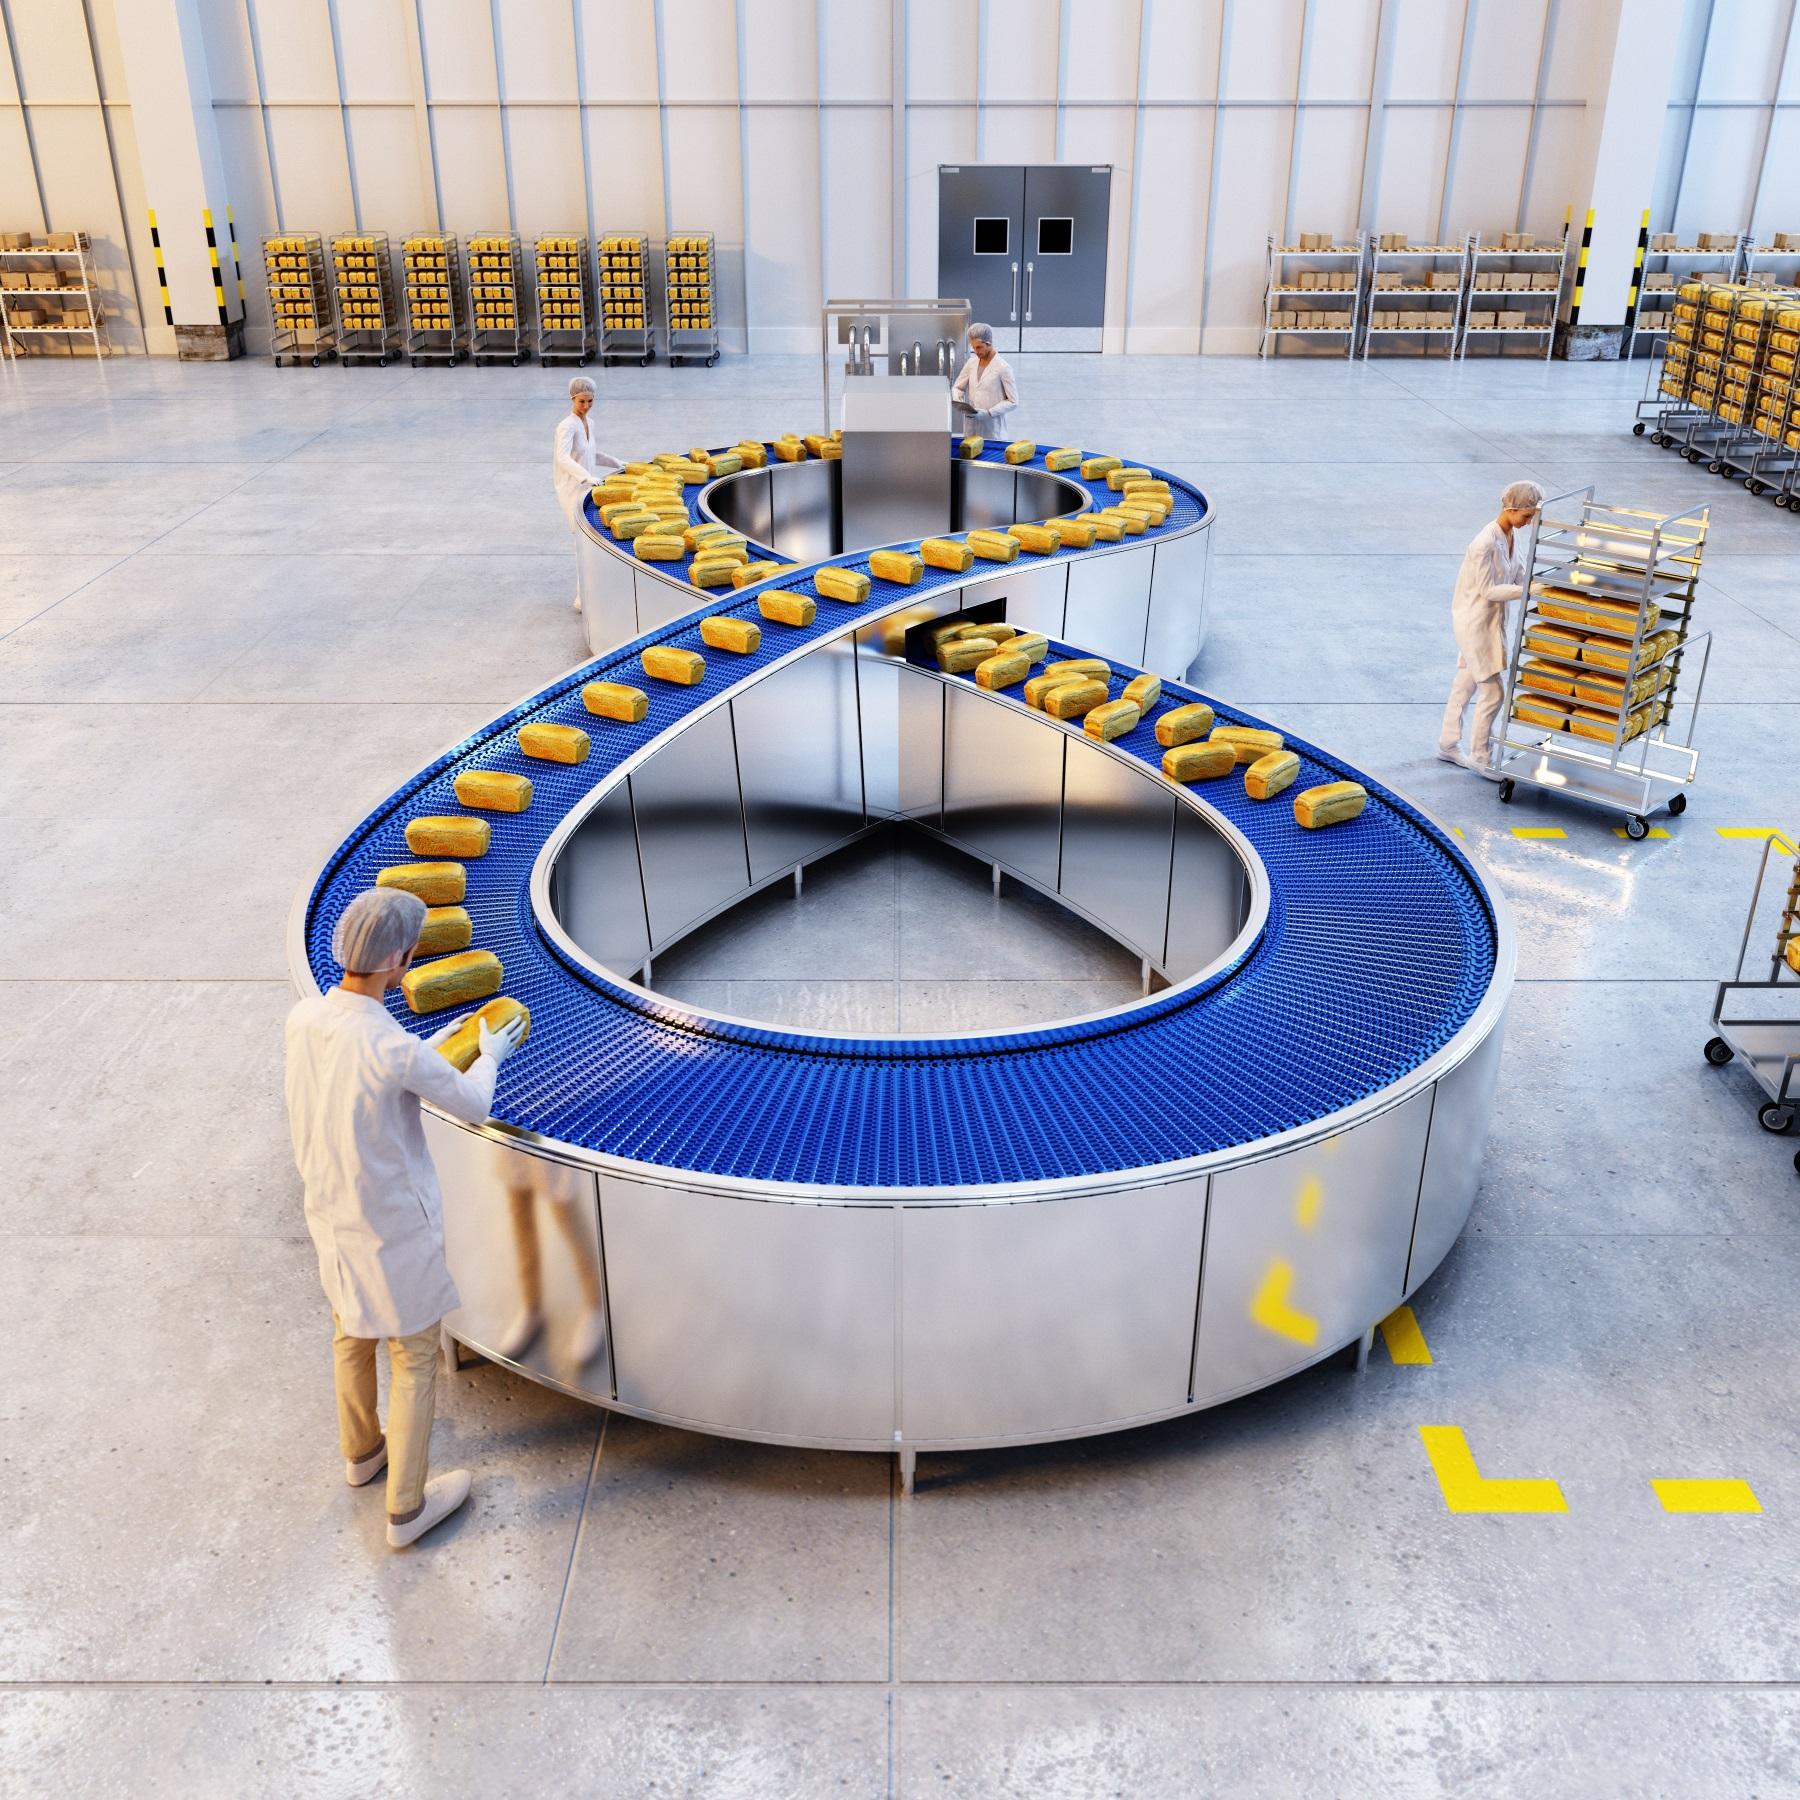 CGI Infinity Conveyor Belt